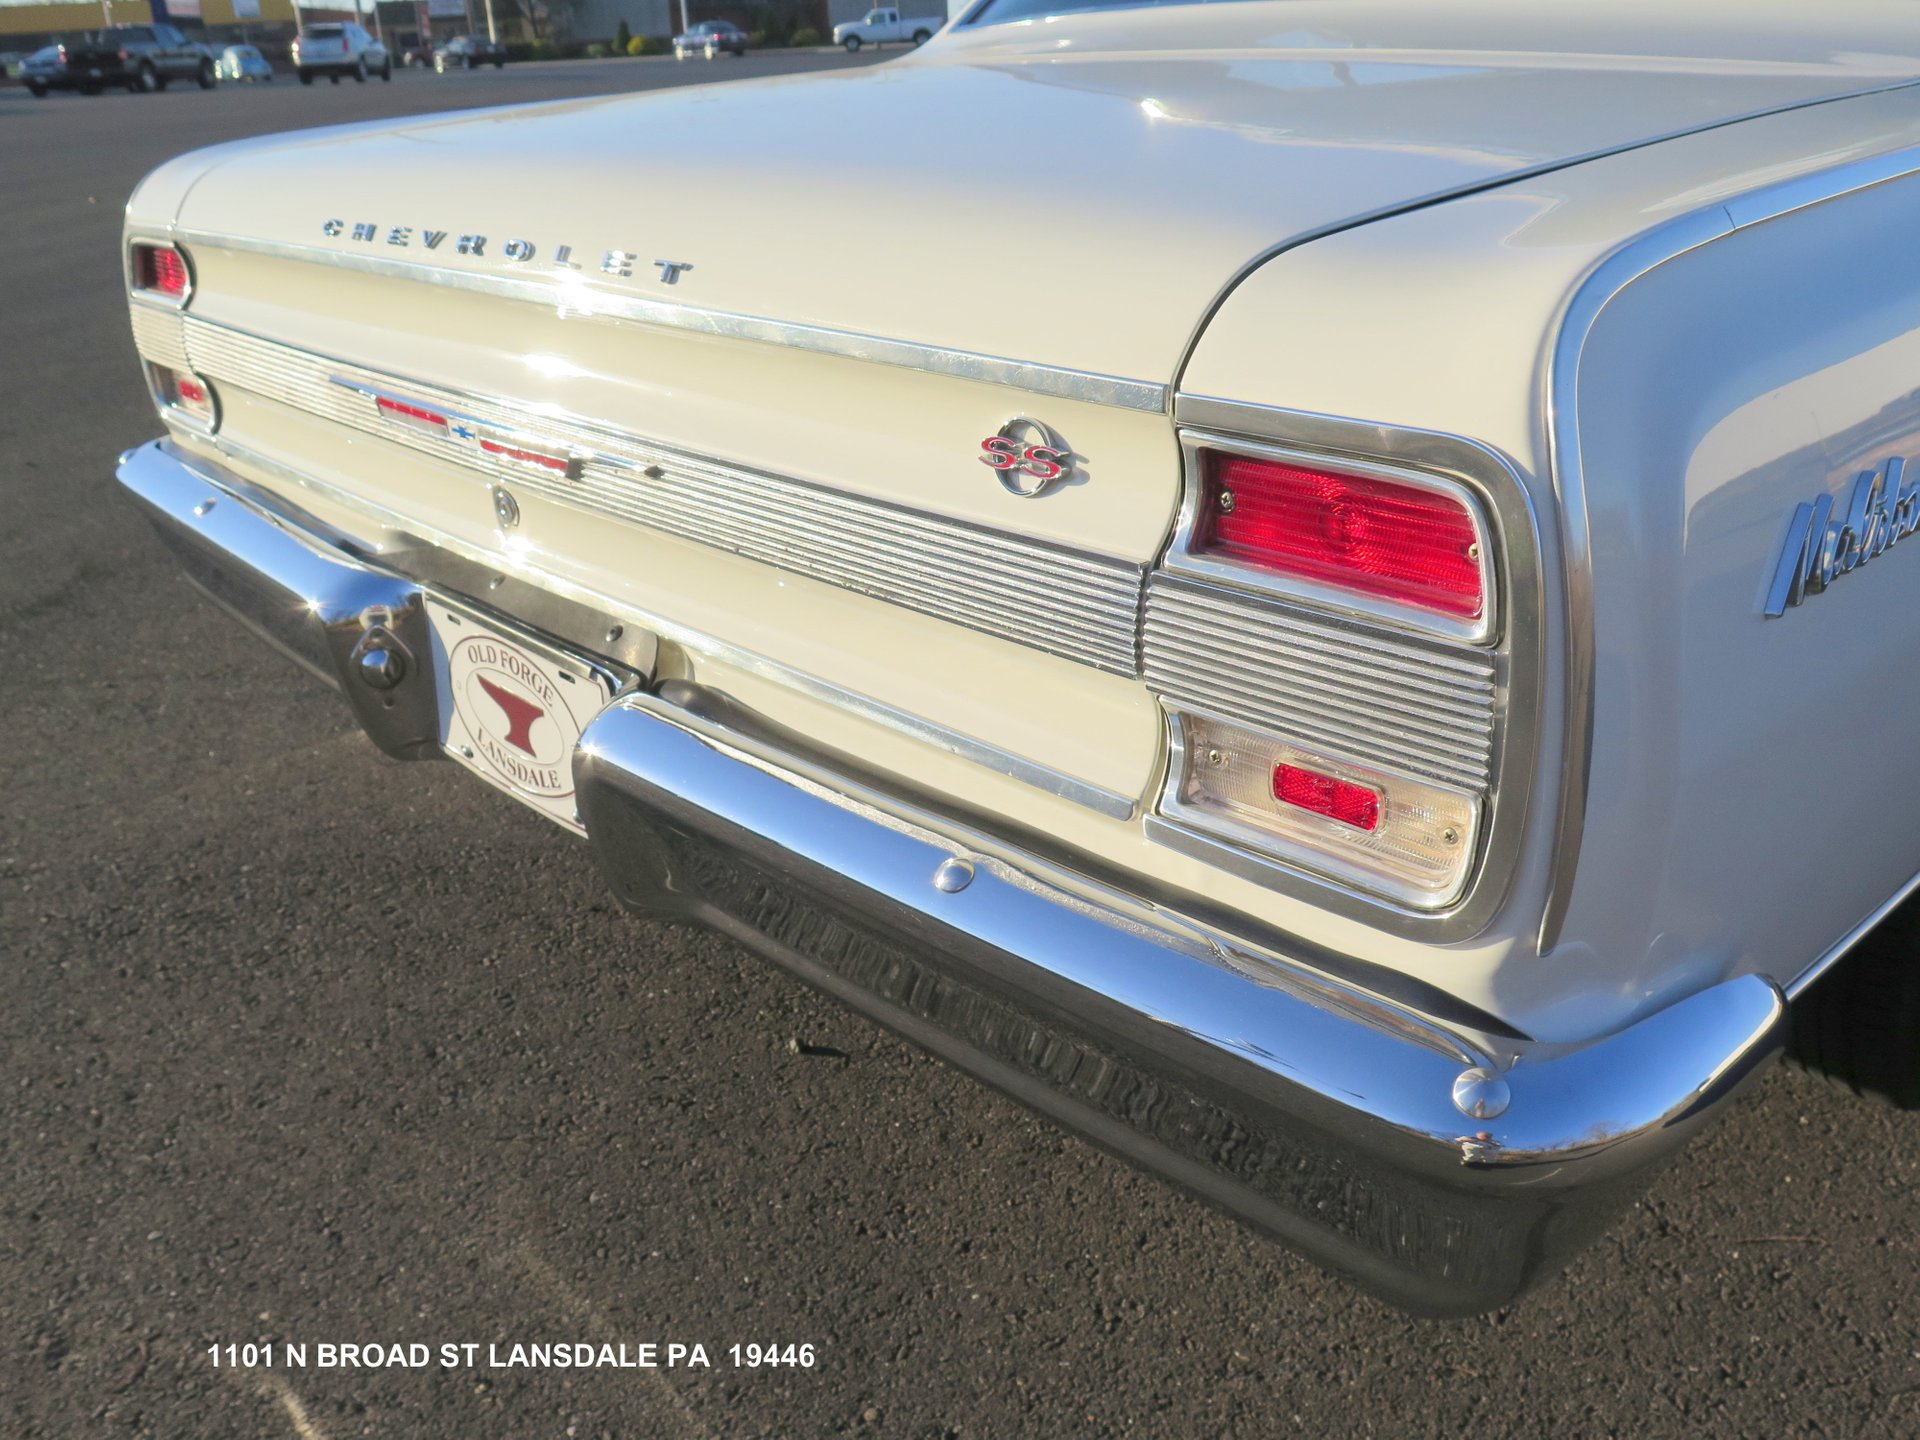 1964 Chevrolet Malibu SS | OLD FORGE MOTORCARS INC